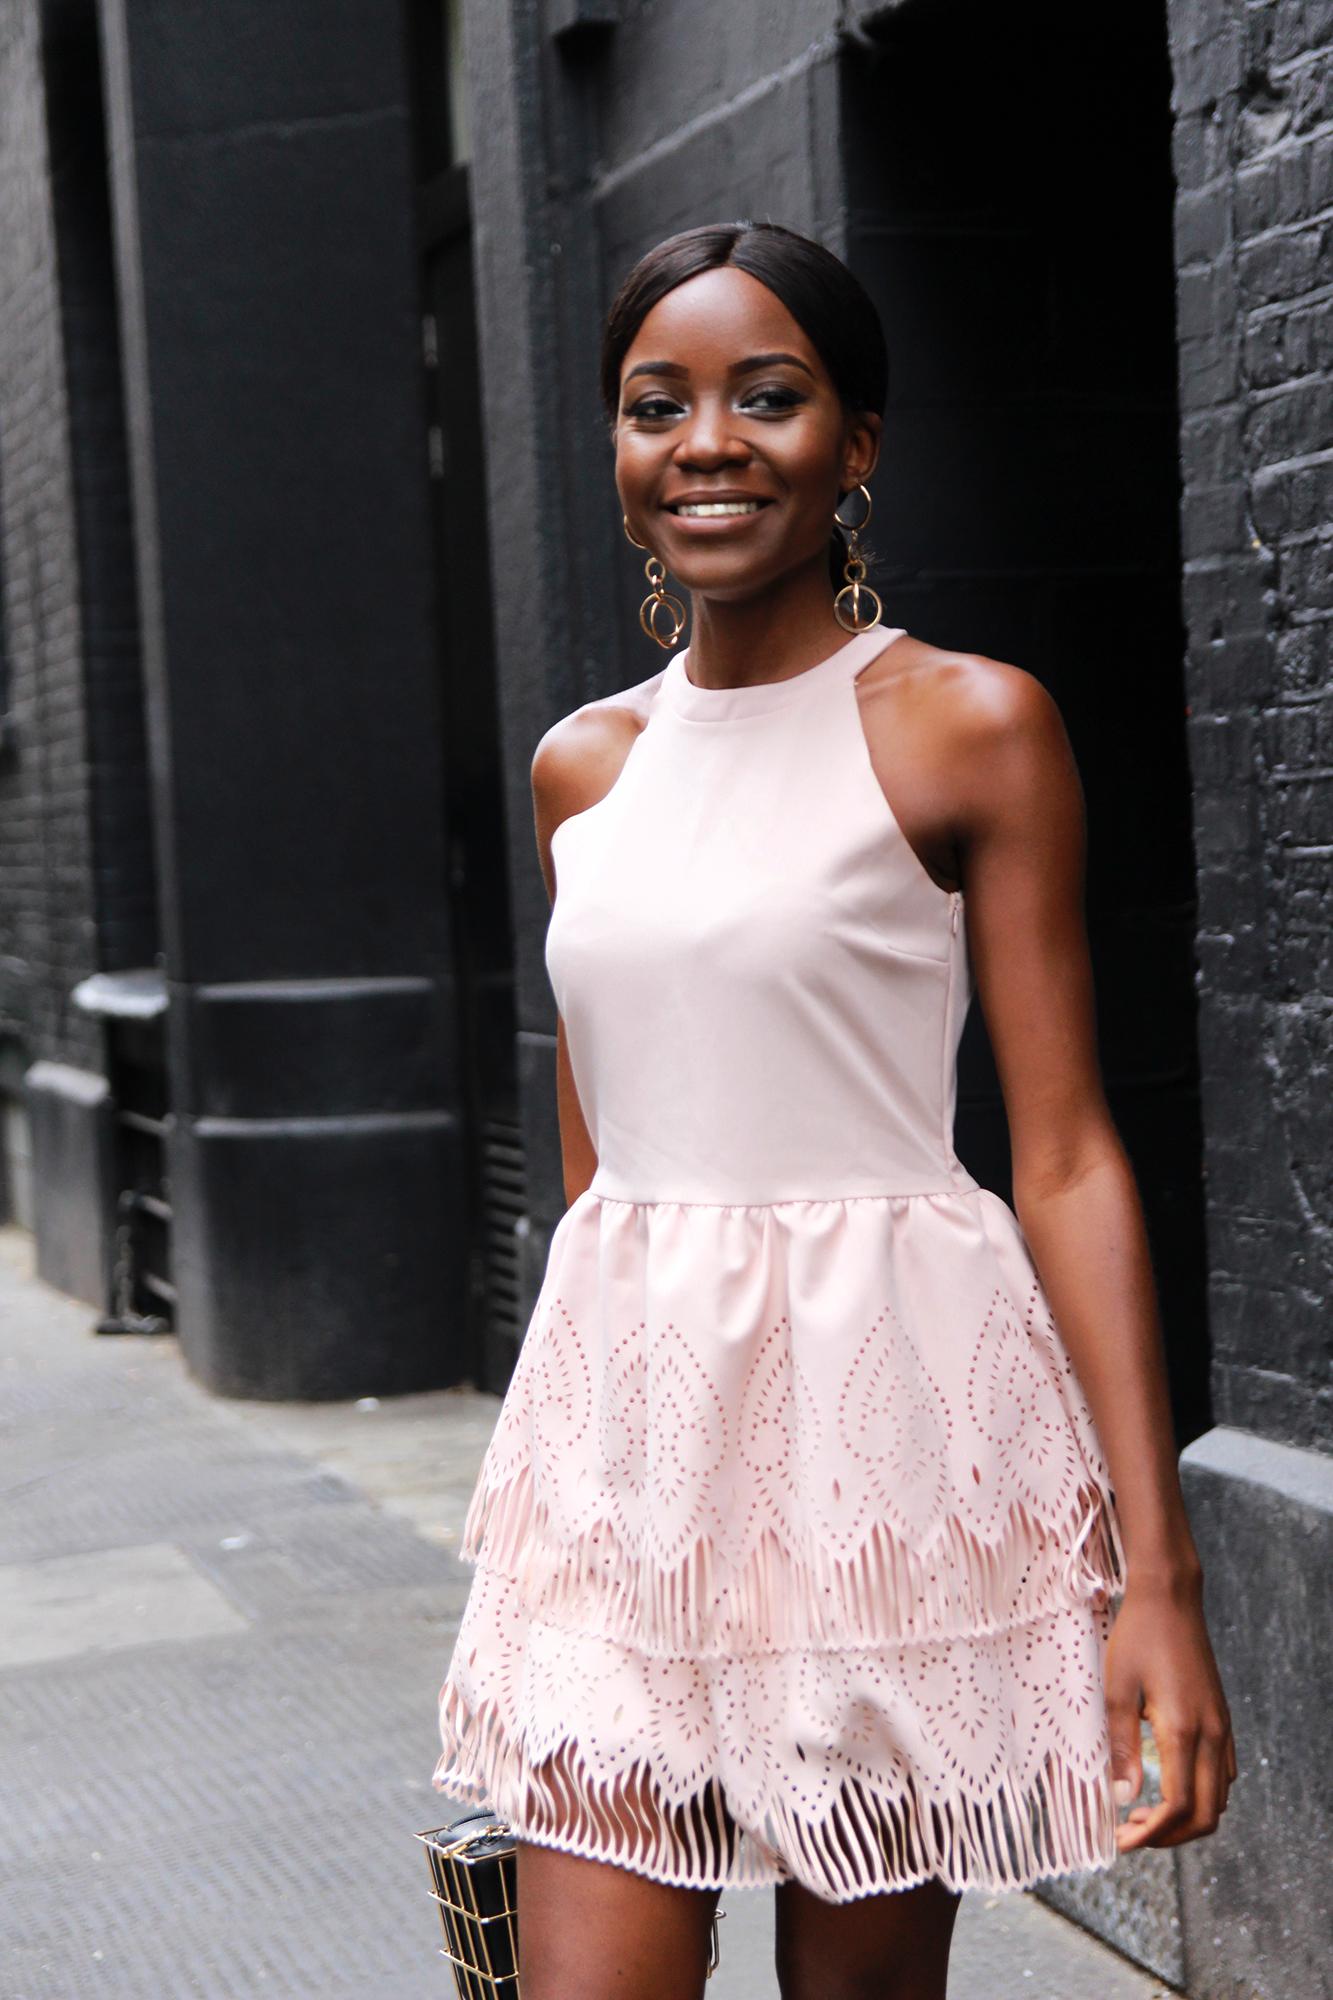 dress to impress in a pink Cut Cutuur lasercut dress